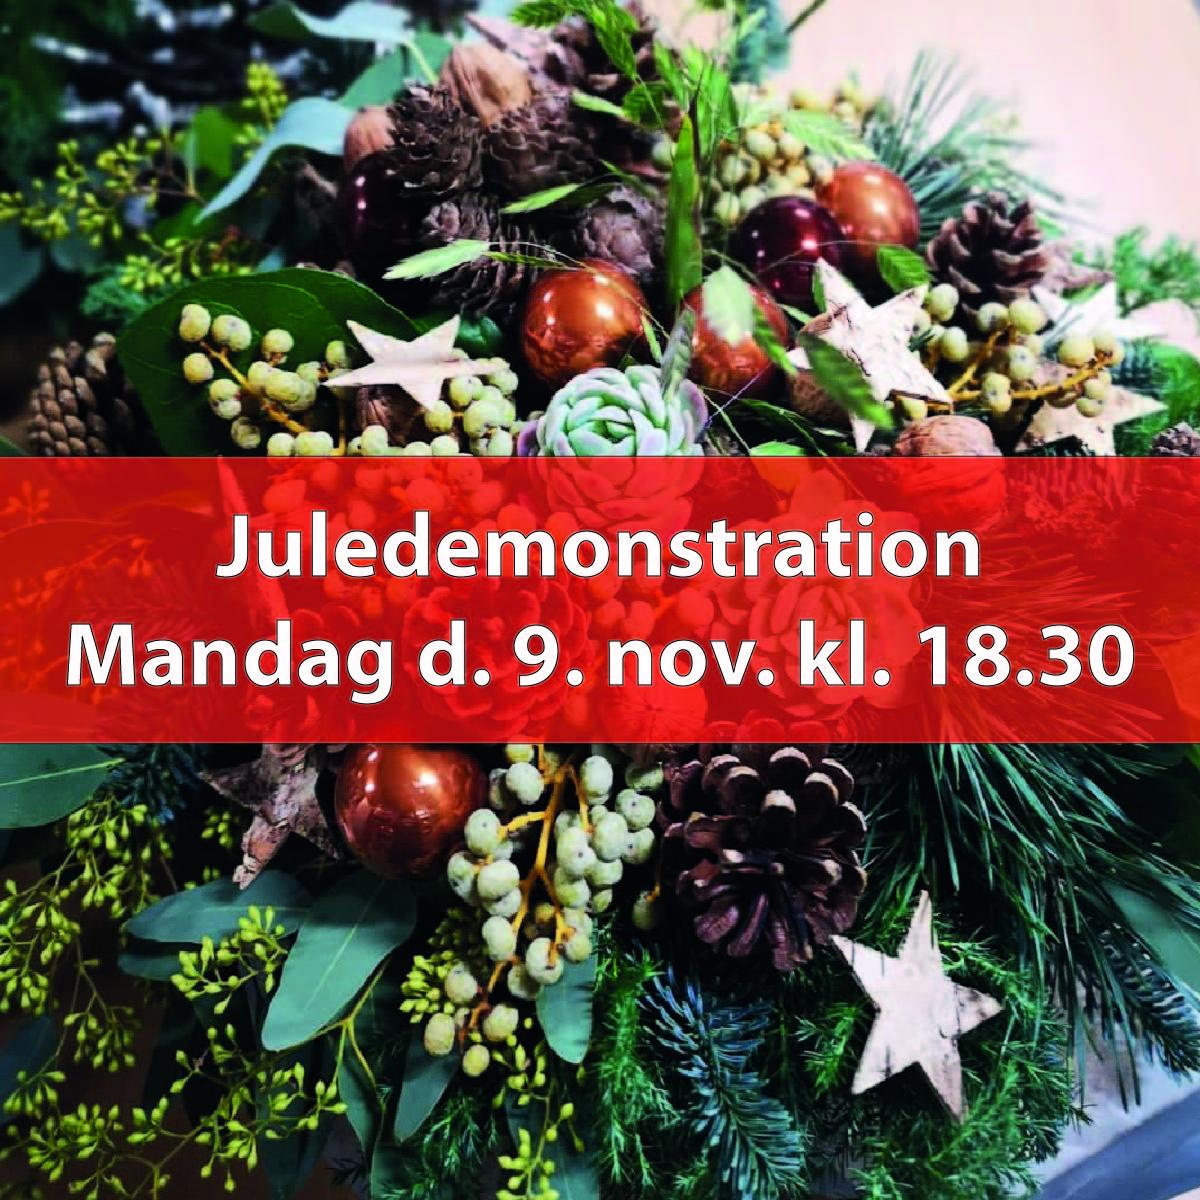 Juledemonstration, Man. 9. nov, kl. 18.30